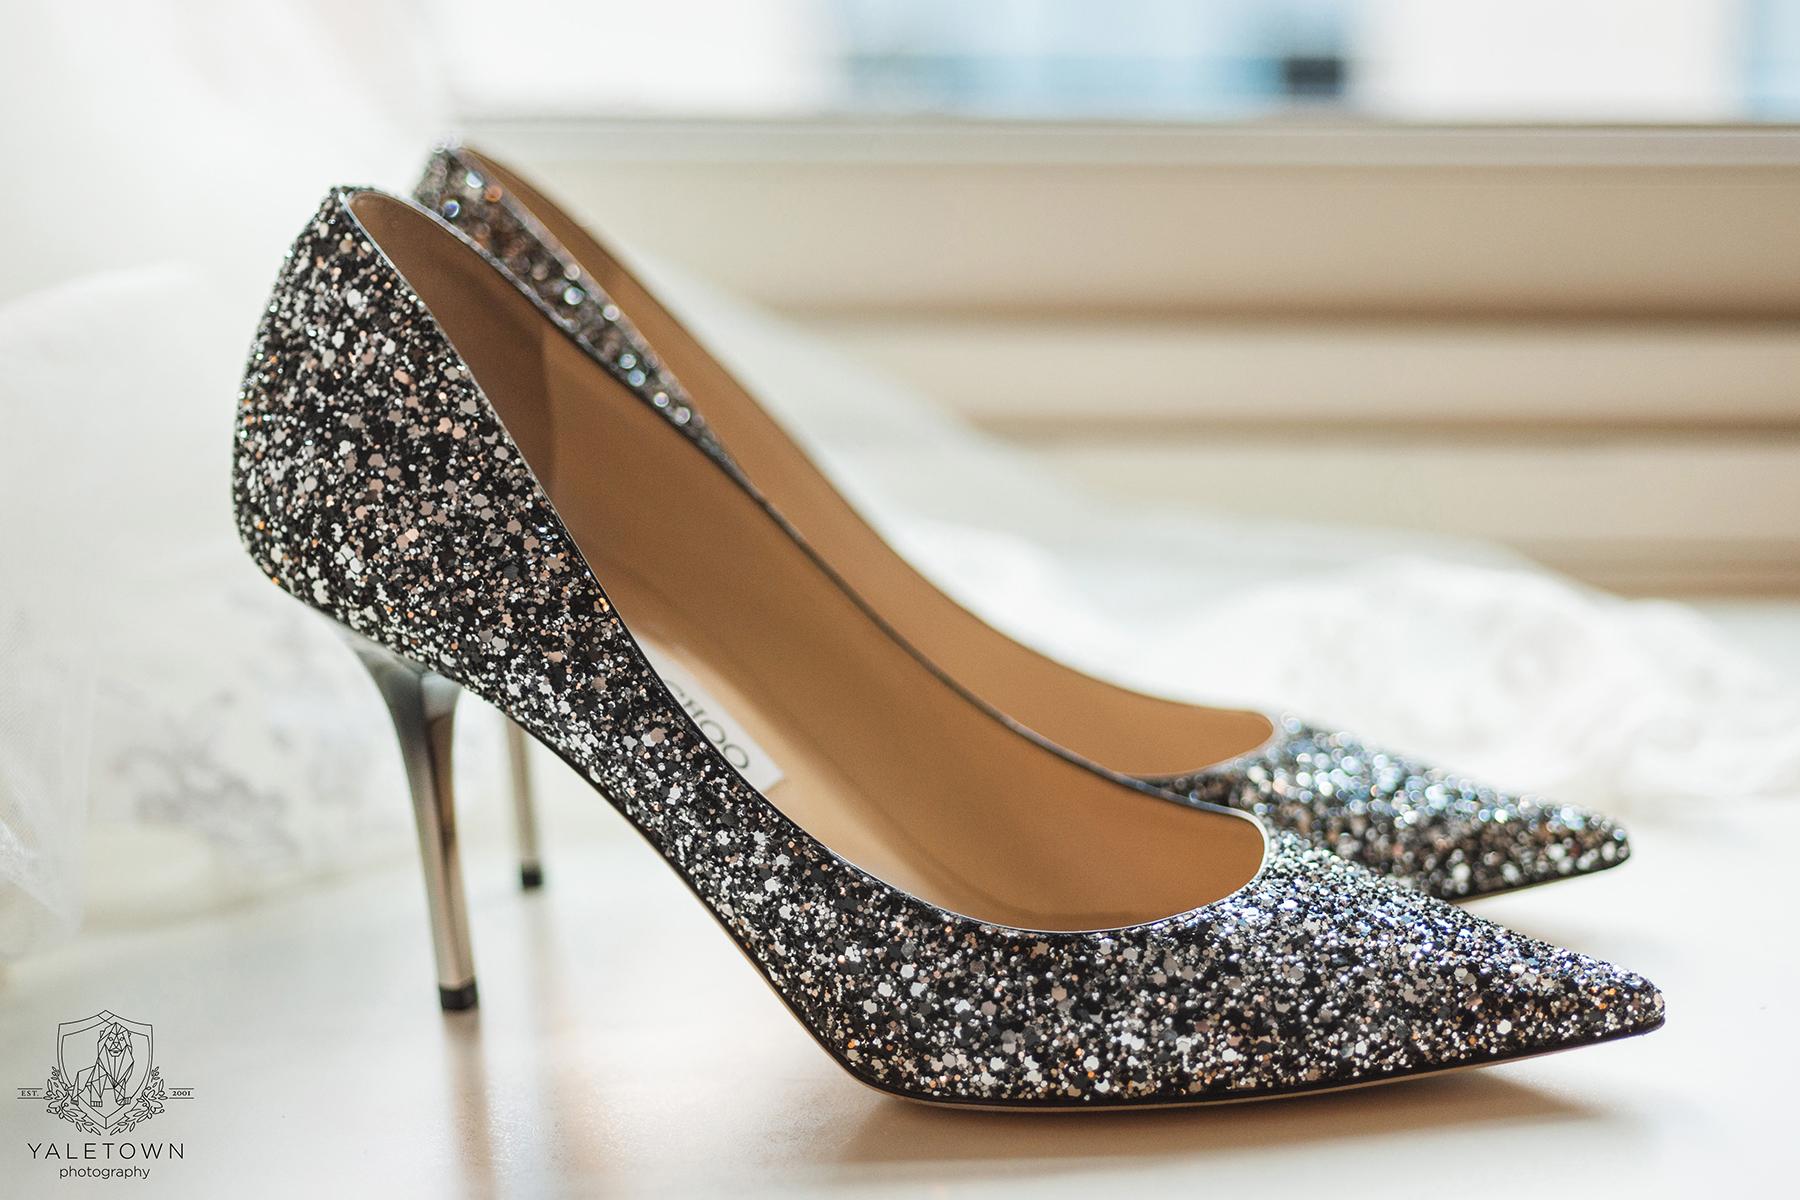 Bridal-Shoes-Jimmy-Choo-Rosewood-Hotel-Georgia-Vancouver-Wedding-Yaletown-Photography-photo